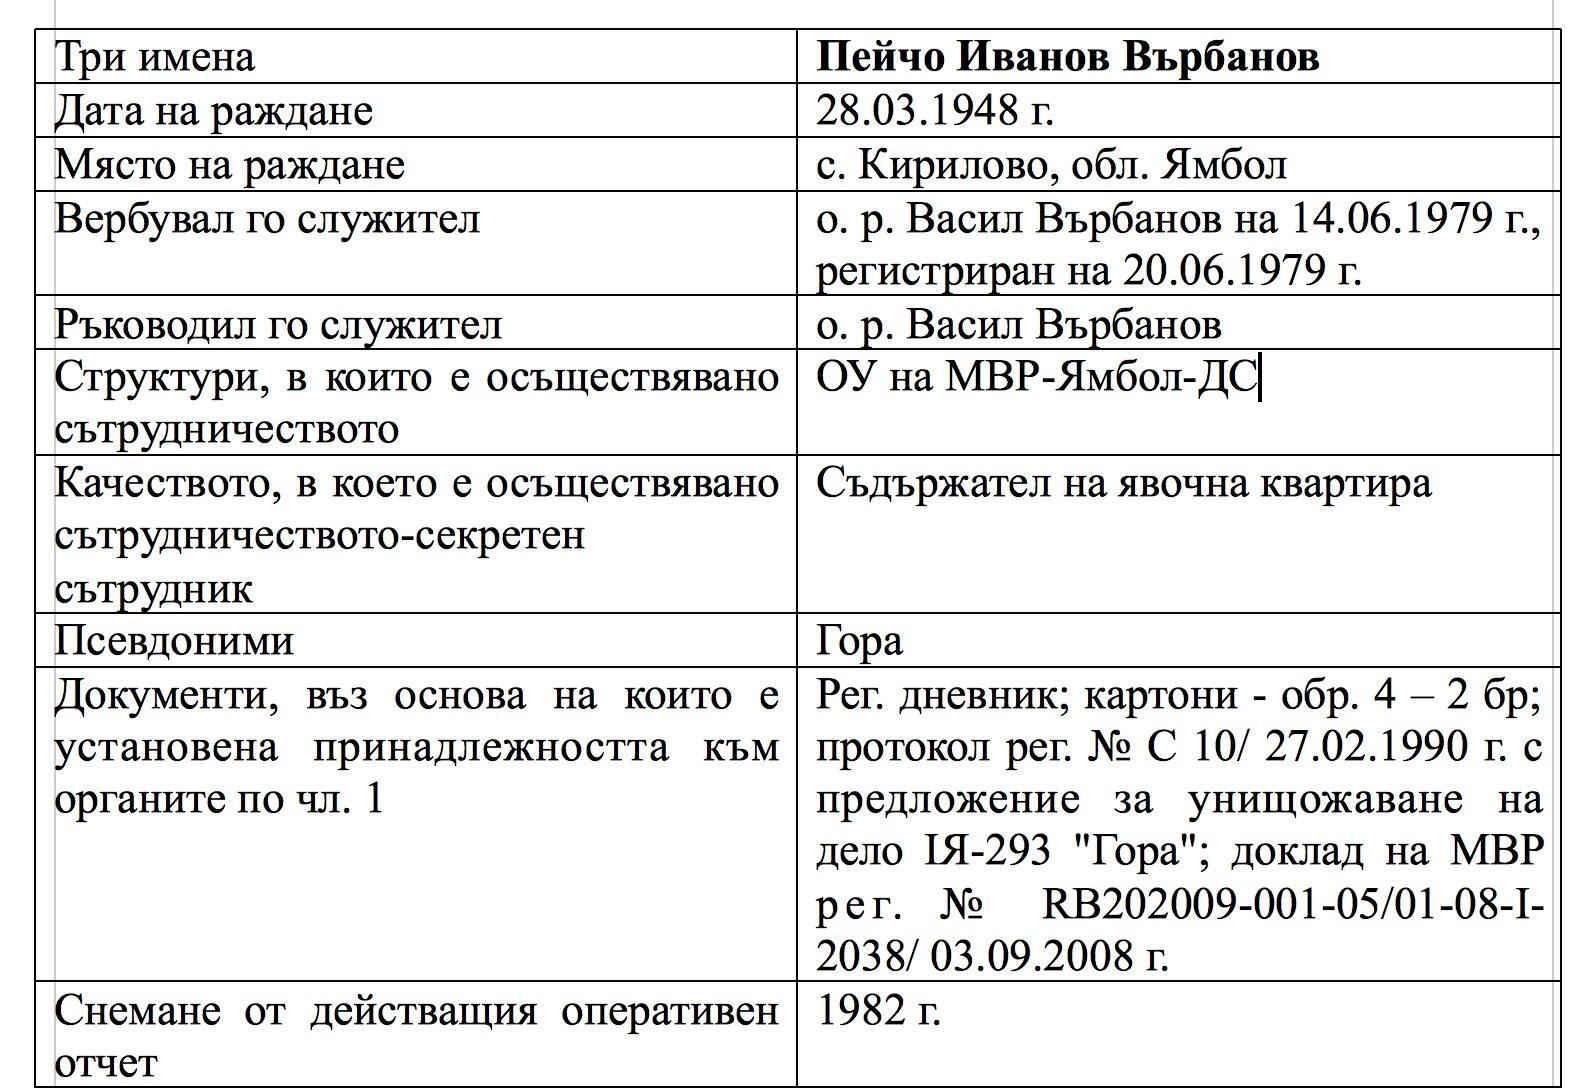 Capture_2013-08-22_a_22.06.35